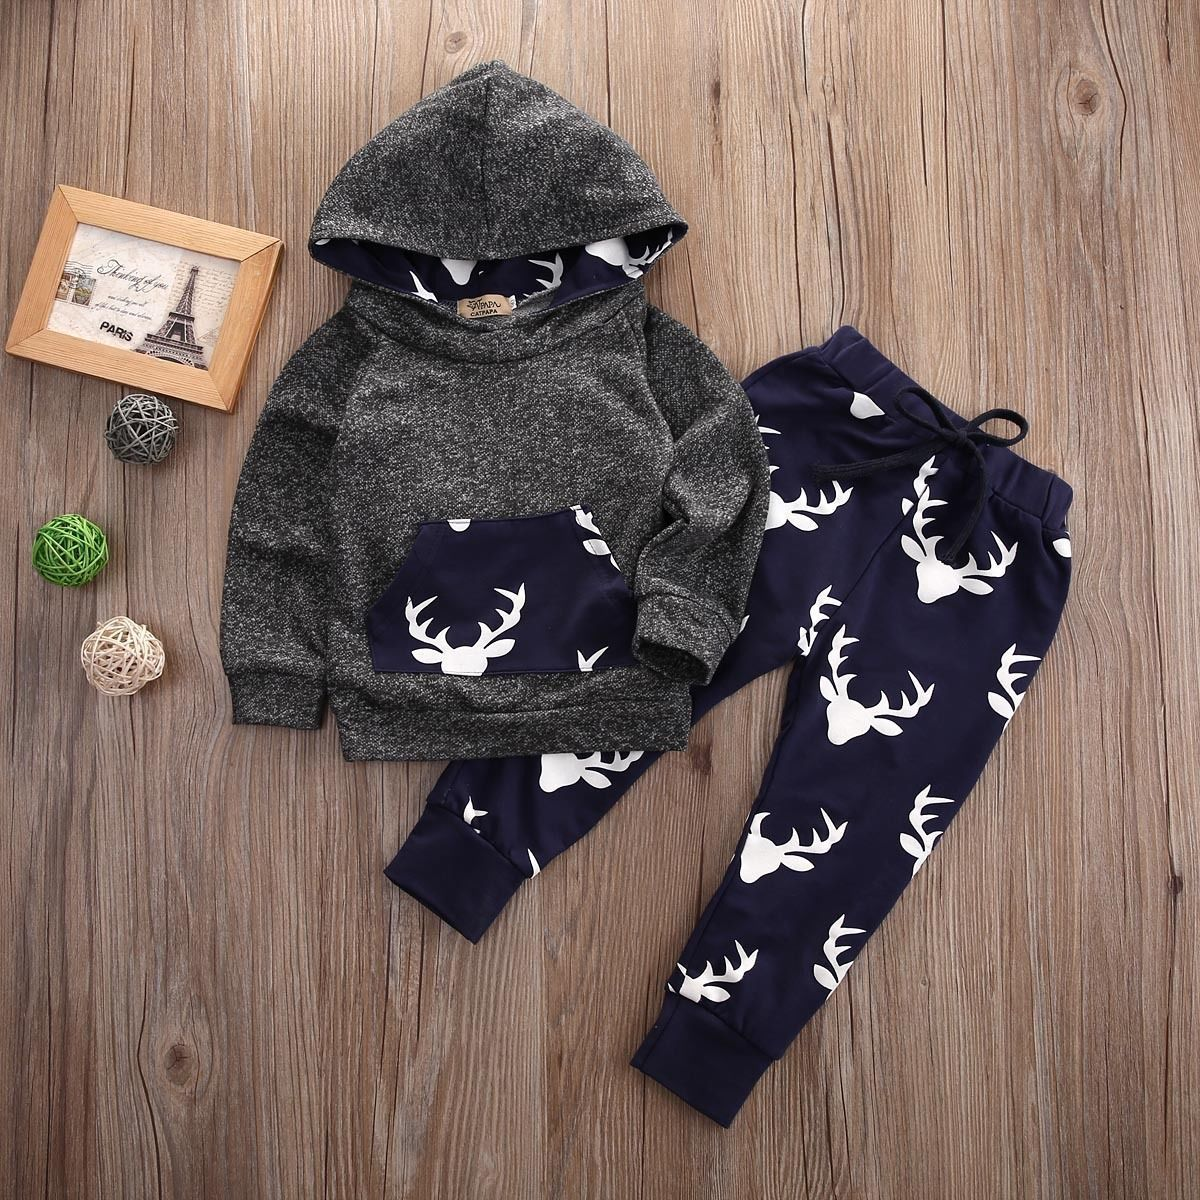 3pcs Toddler Infant Newborn Baby Boy Girl T-shirt Tops+Pants+Hats Outfit Set lot